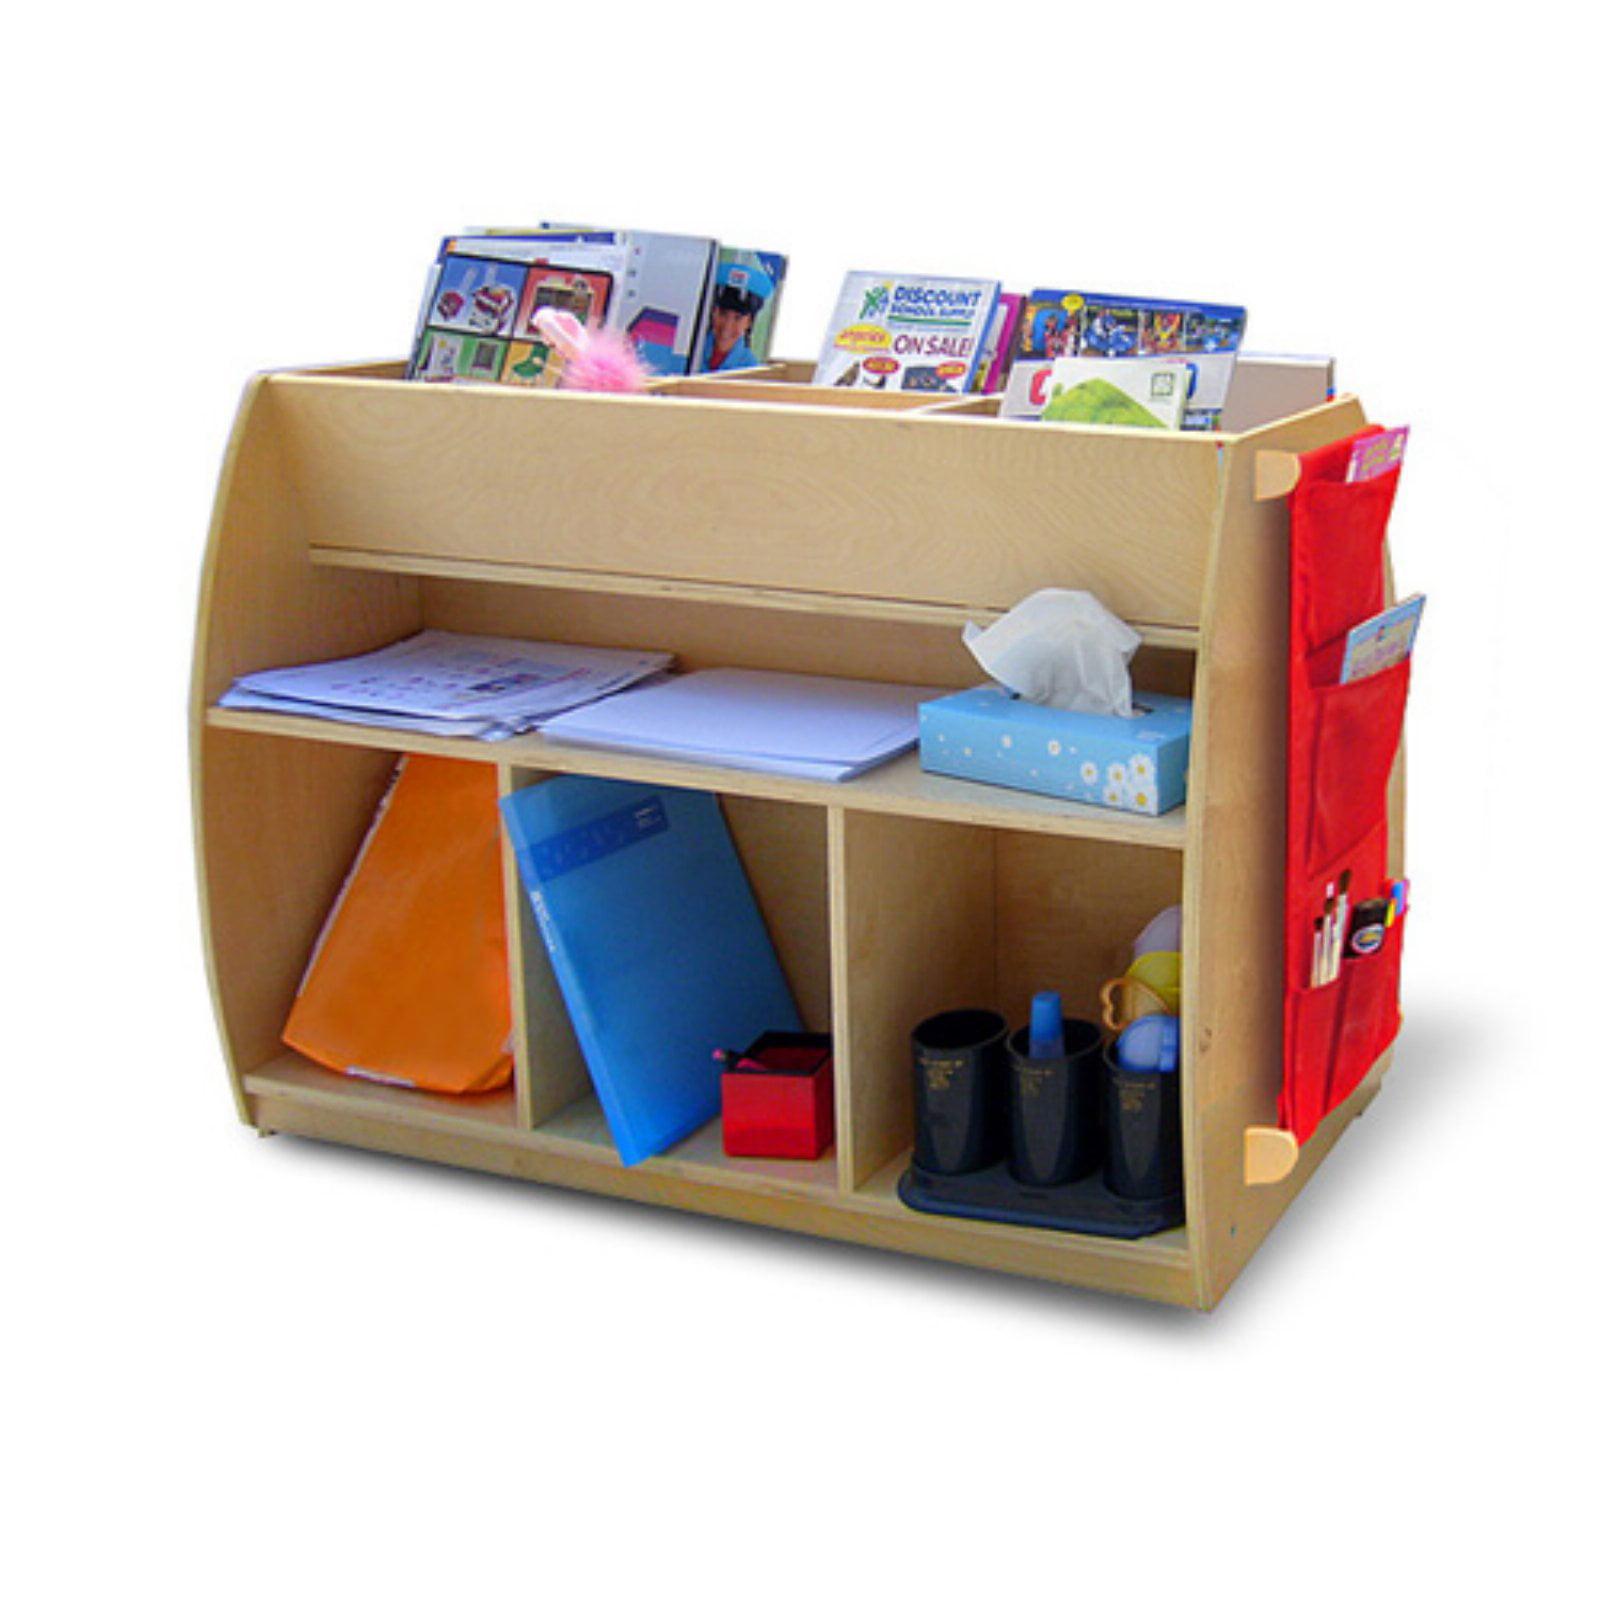 A+ Childsupply Arch Book Browser